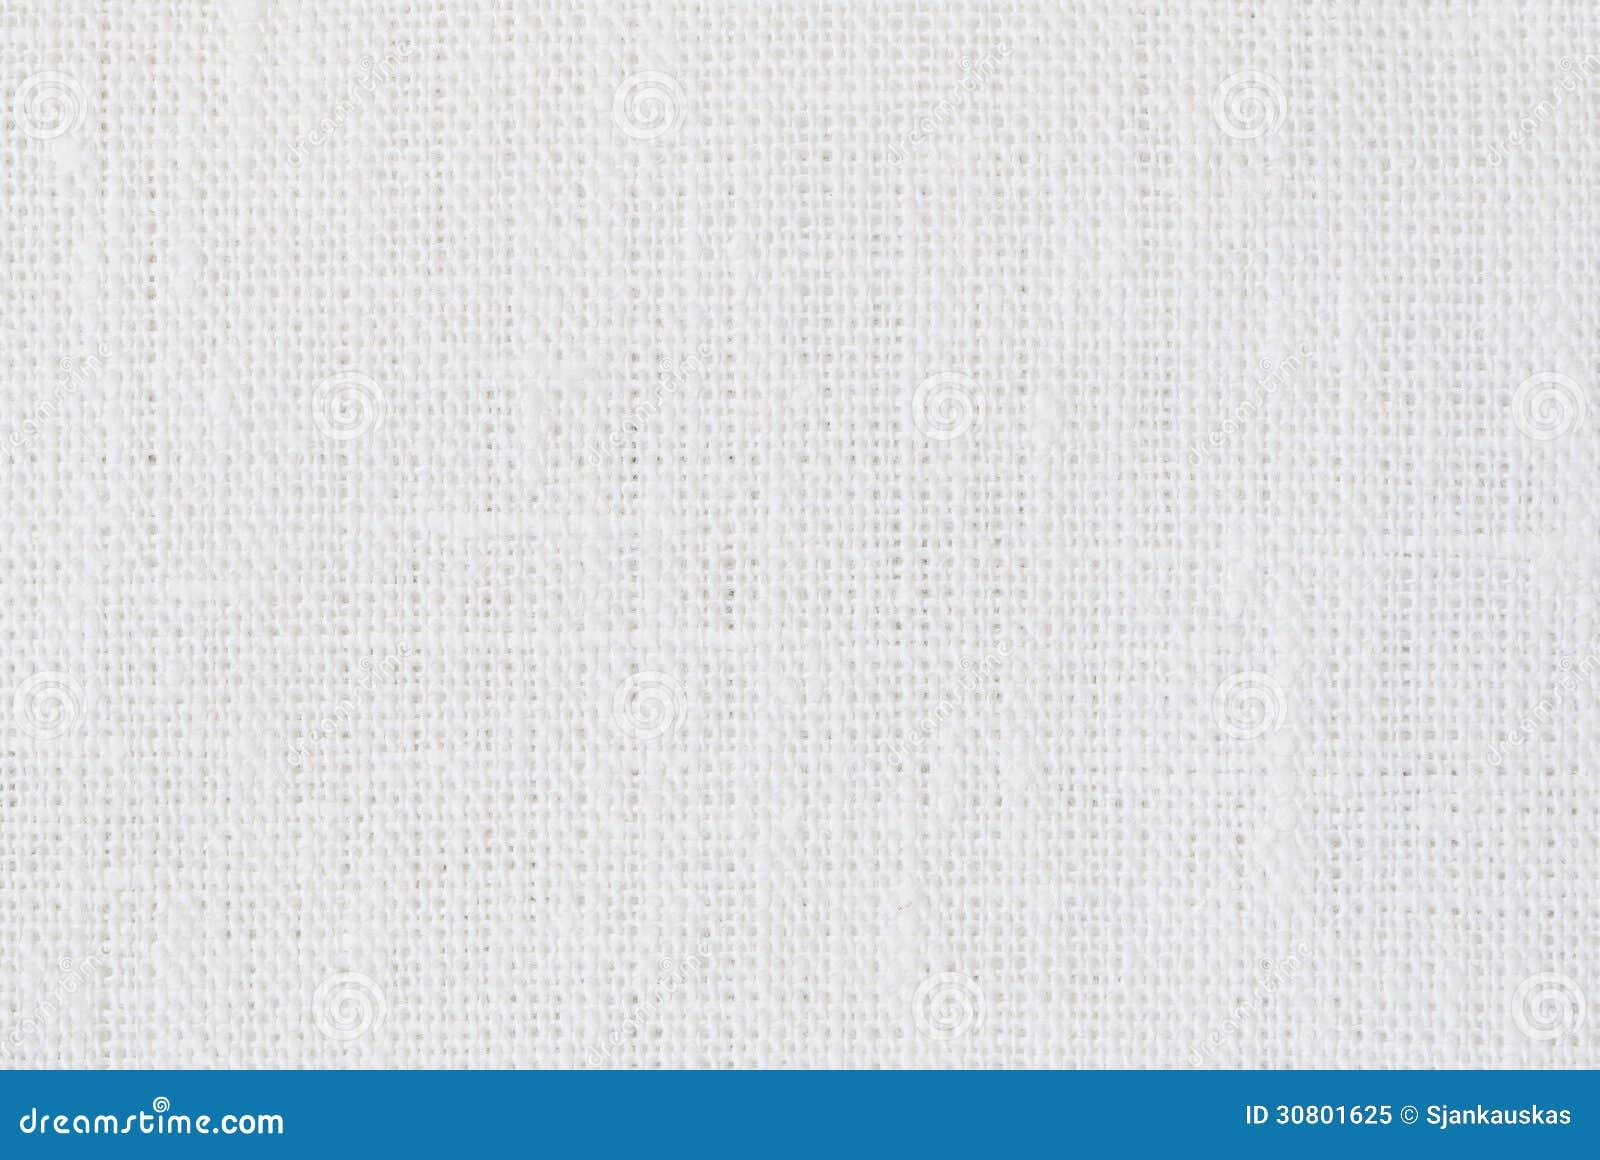 white linen paper background - photo #22